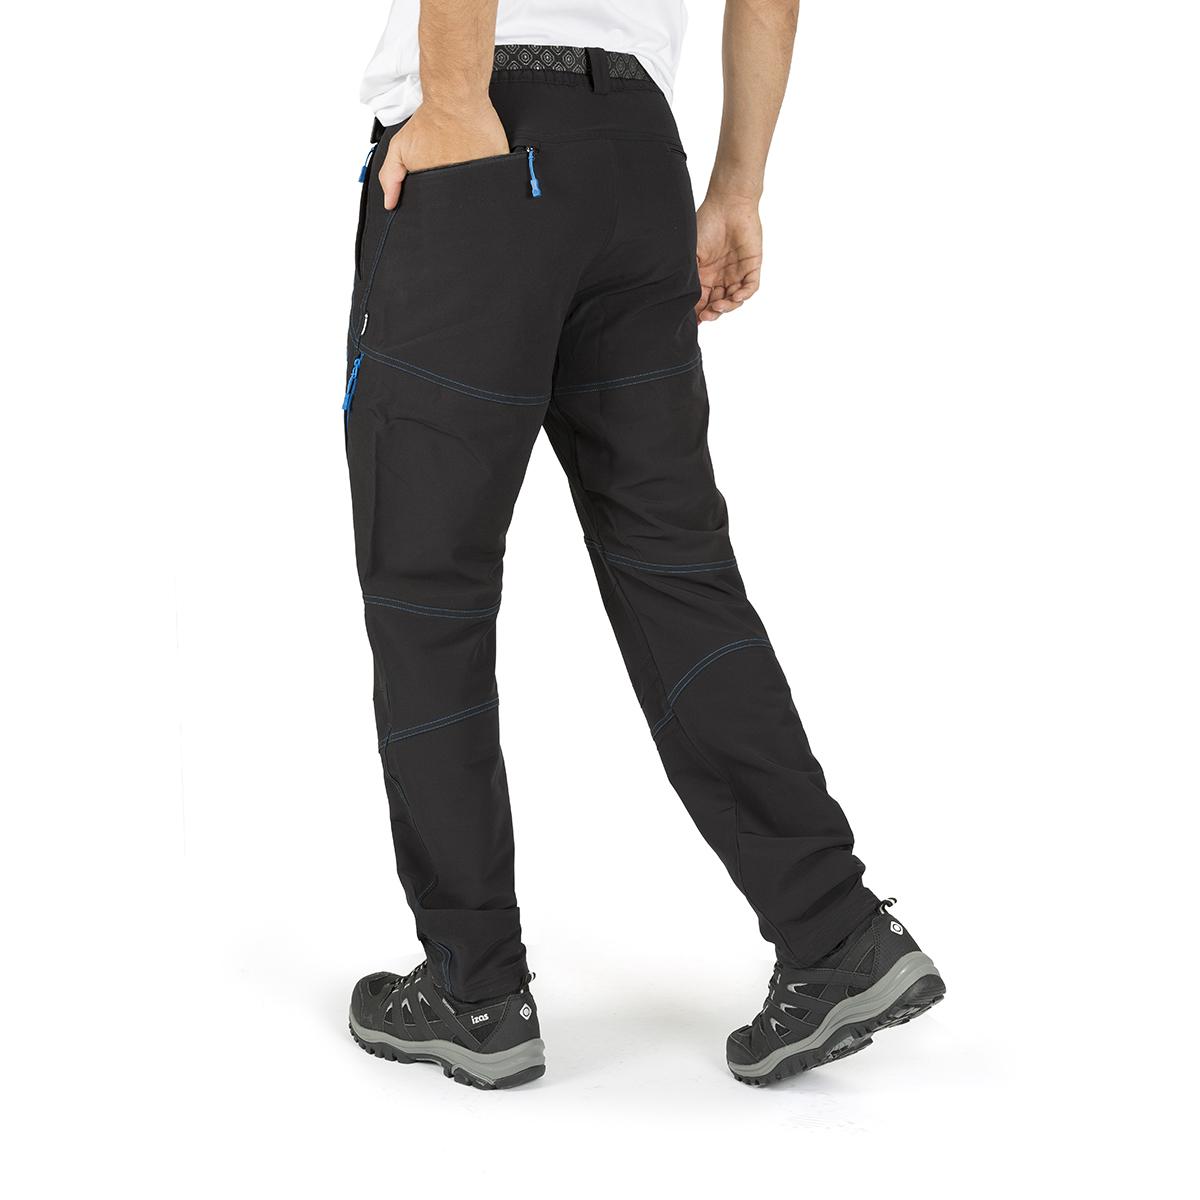 MAN'S VOIRON MOUNT-STRETCH PANT BLACK